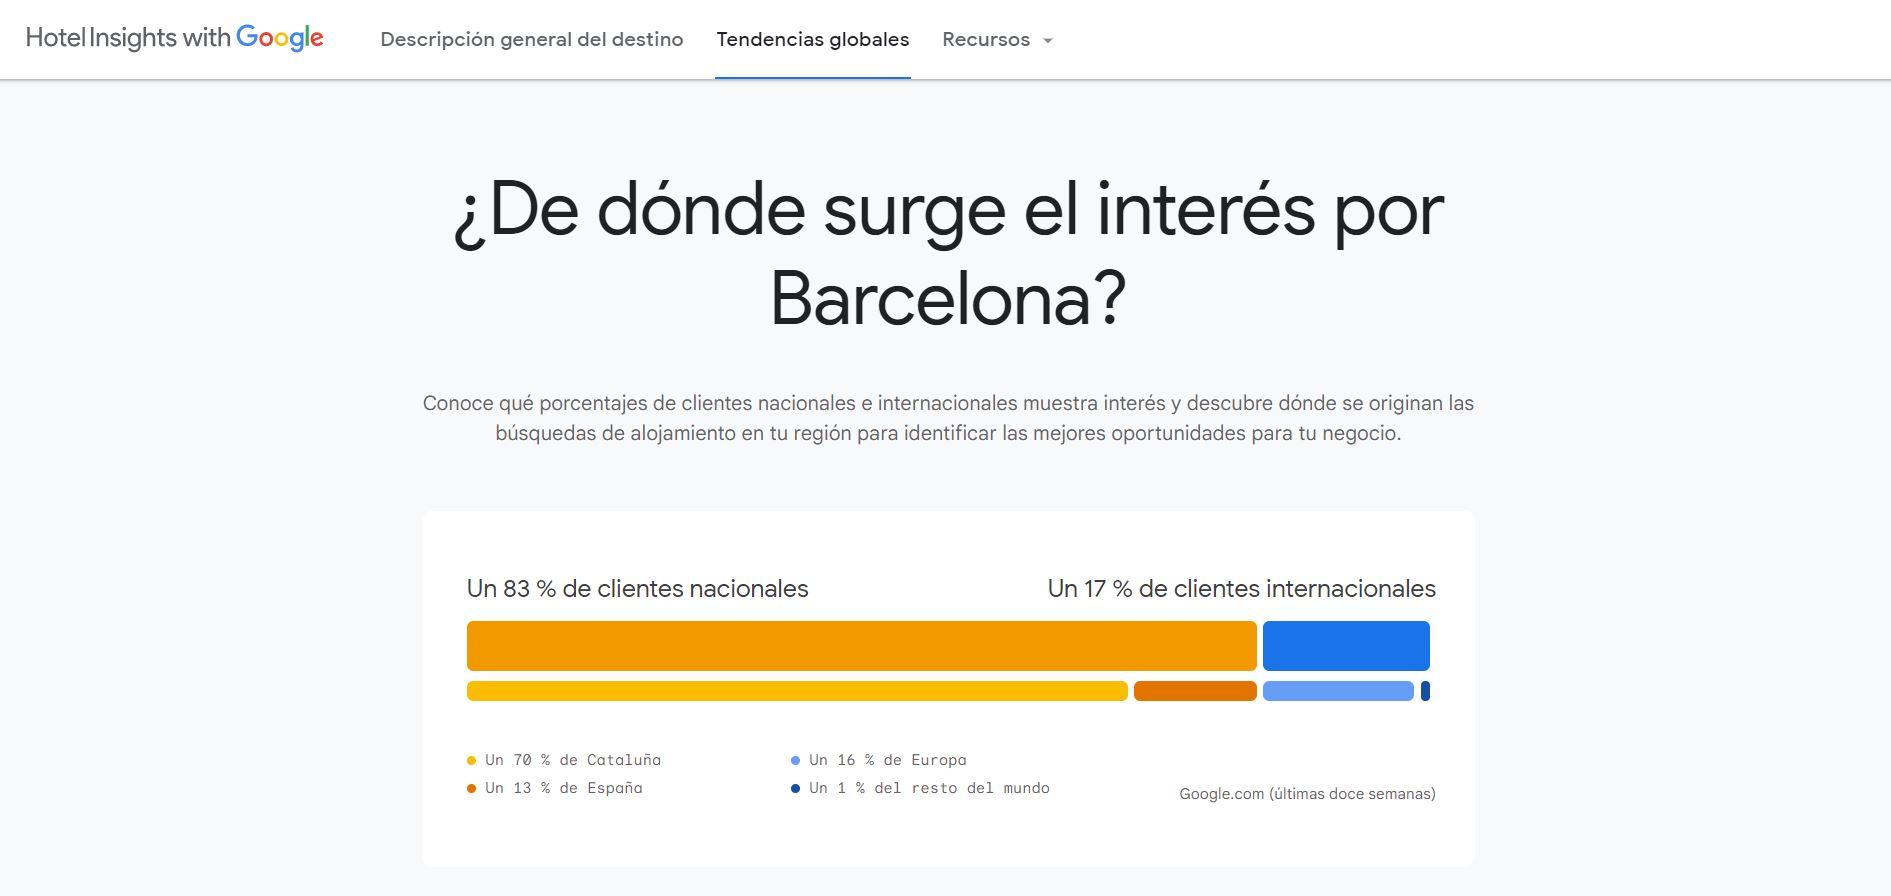 Interés por Barcelona en Google Hotel Insights